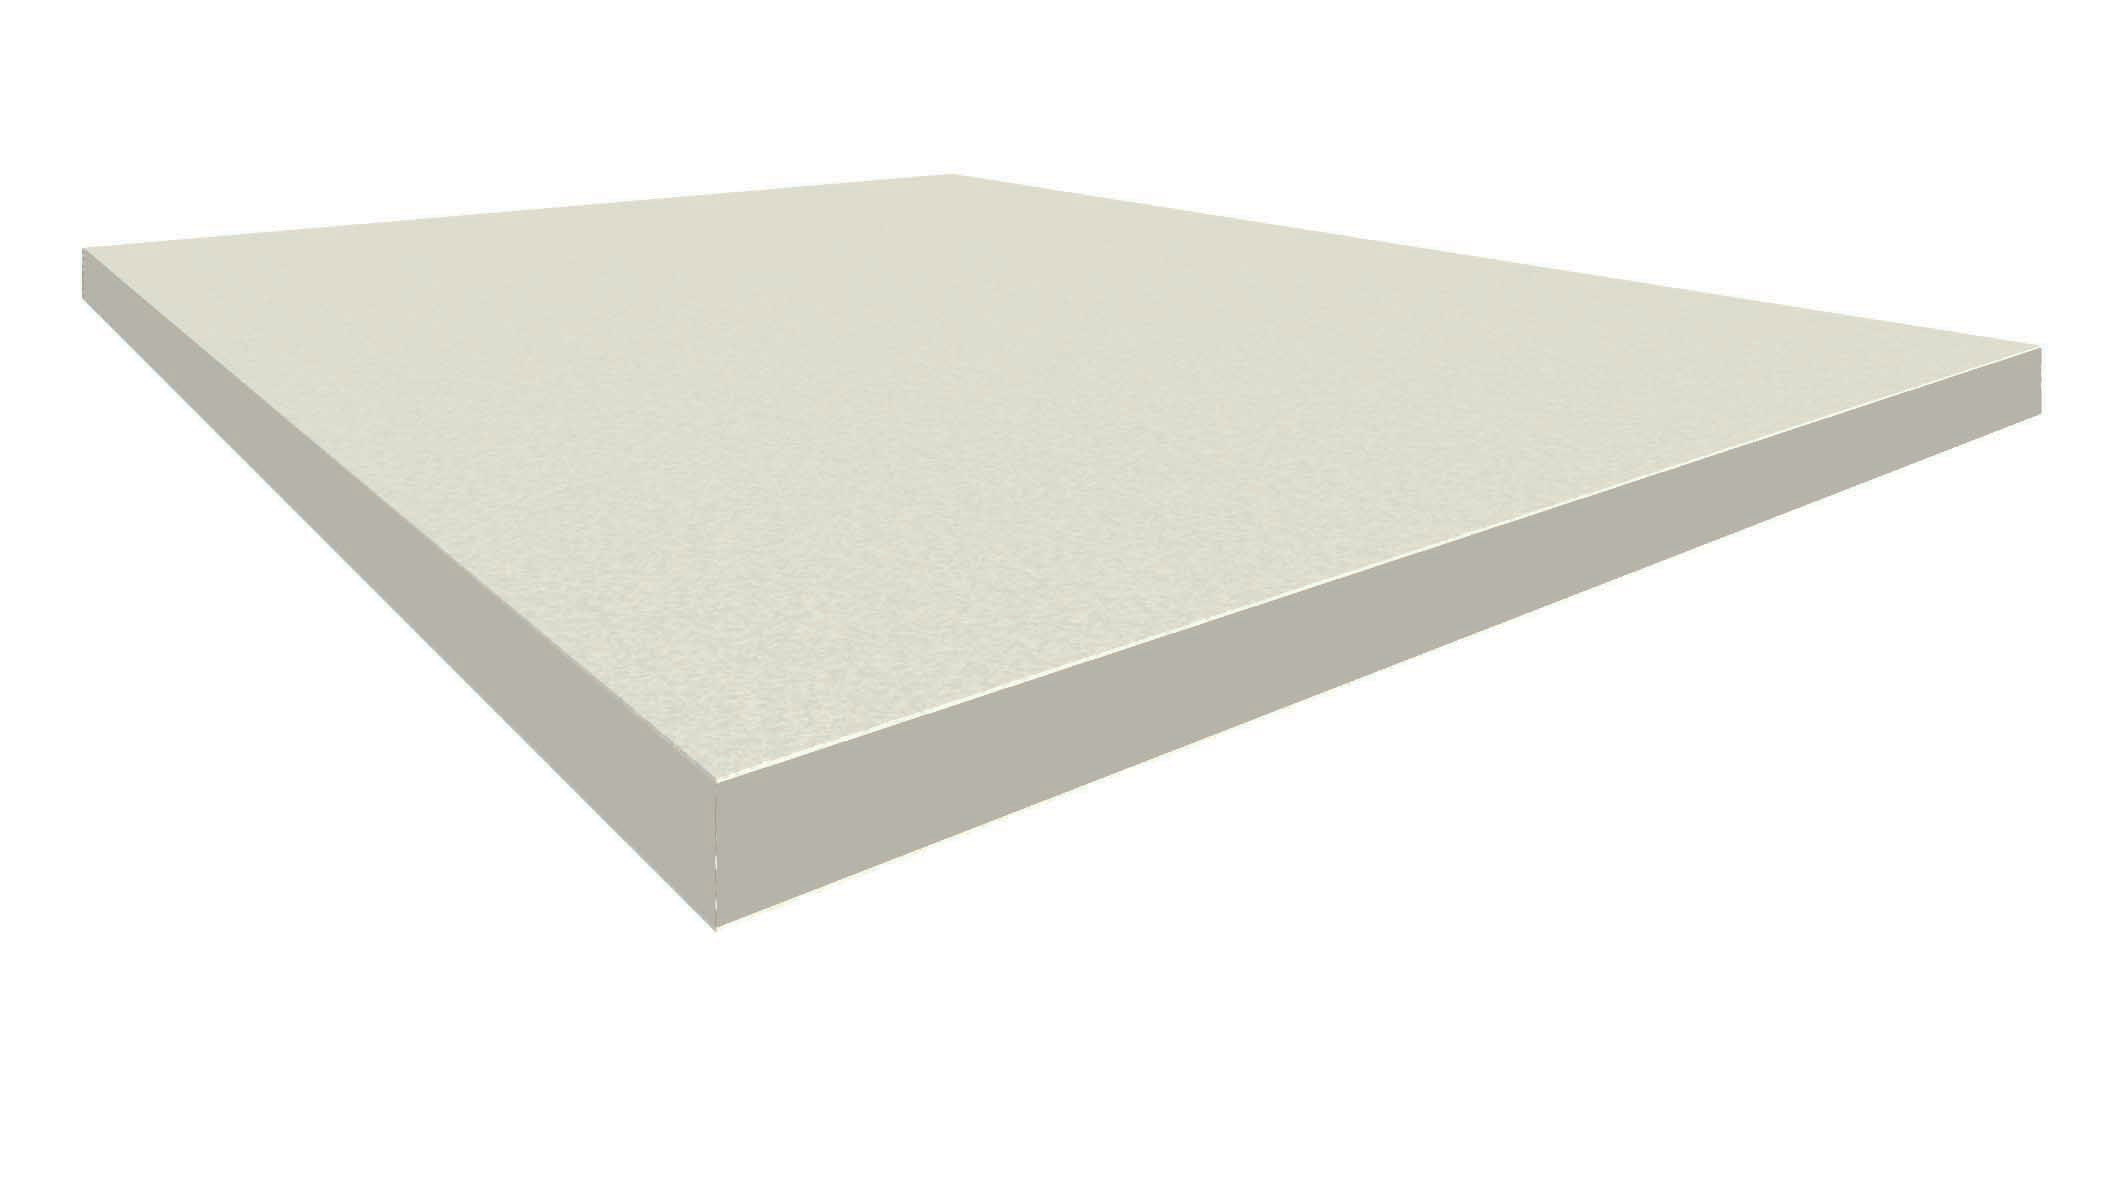 GYPSOTECH® EXTERNA light: Lastra in cemento